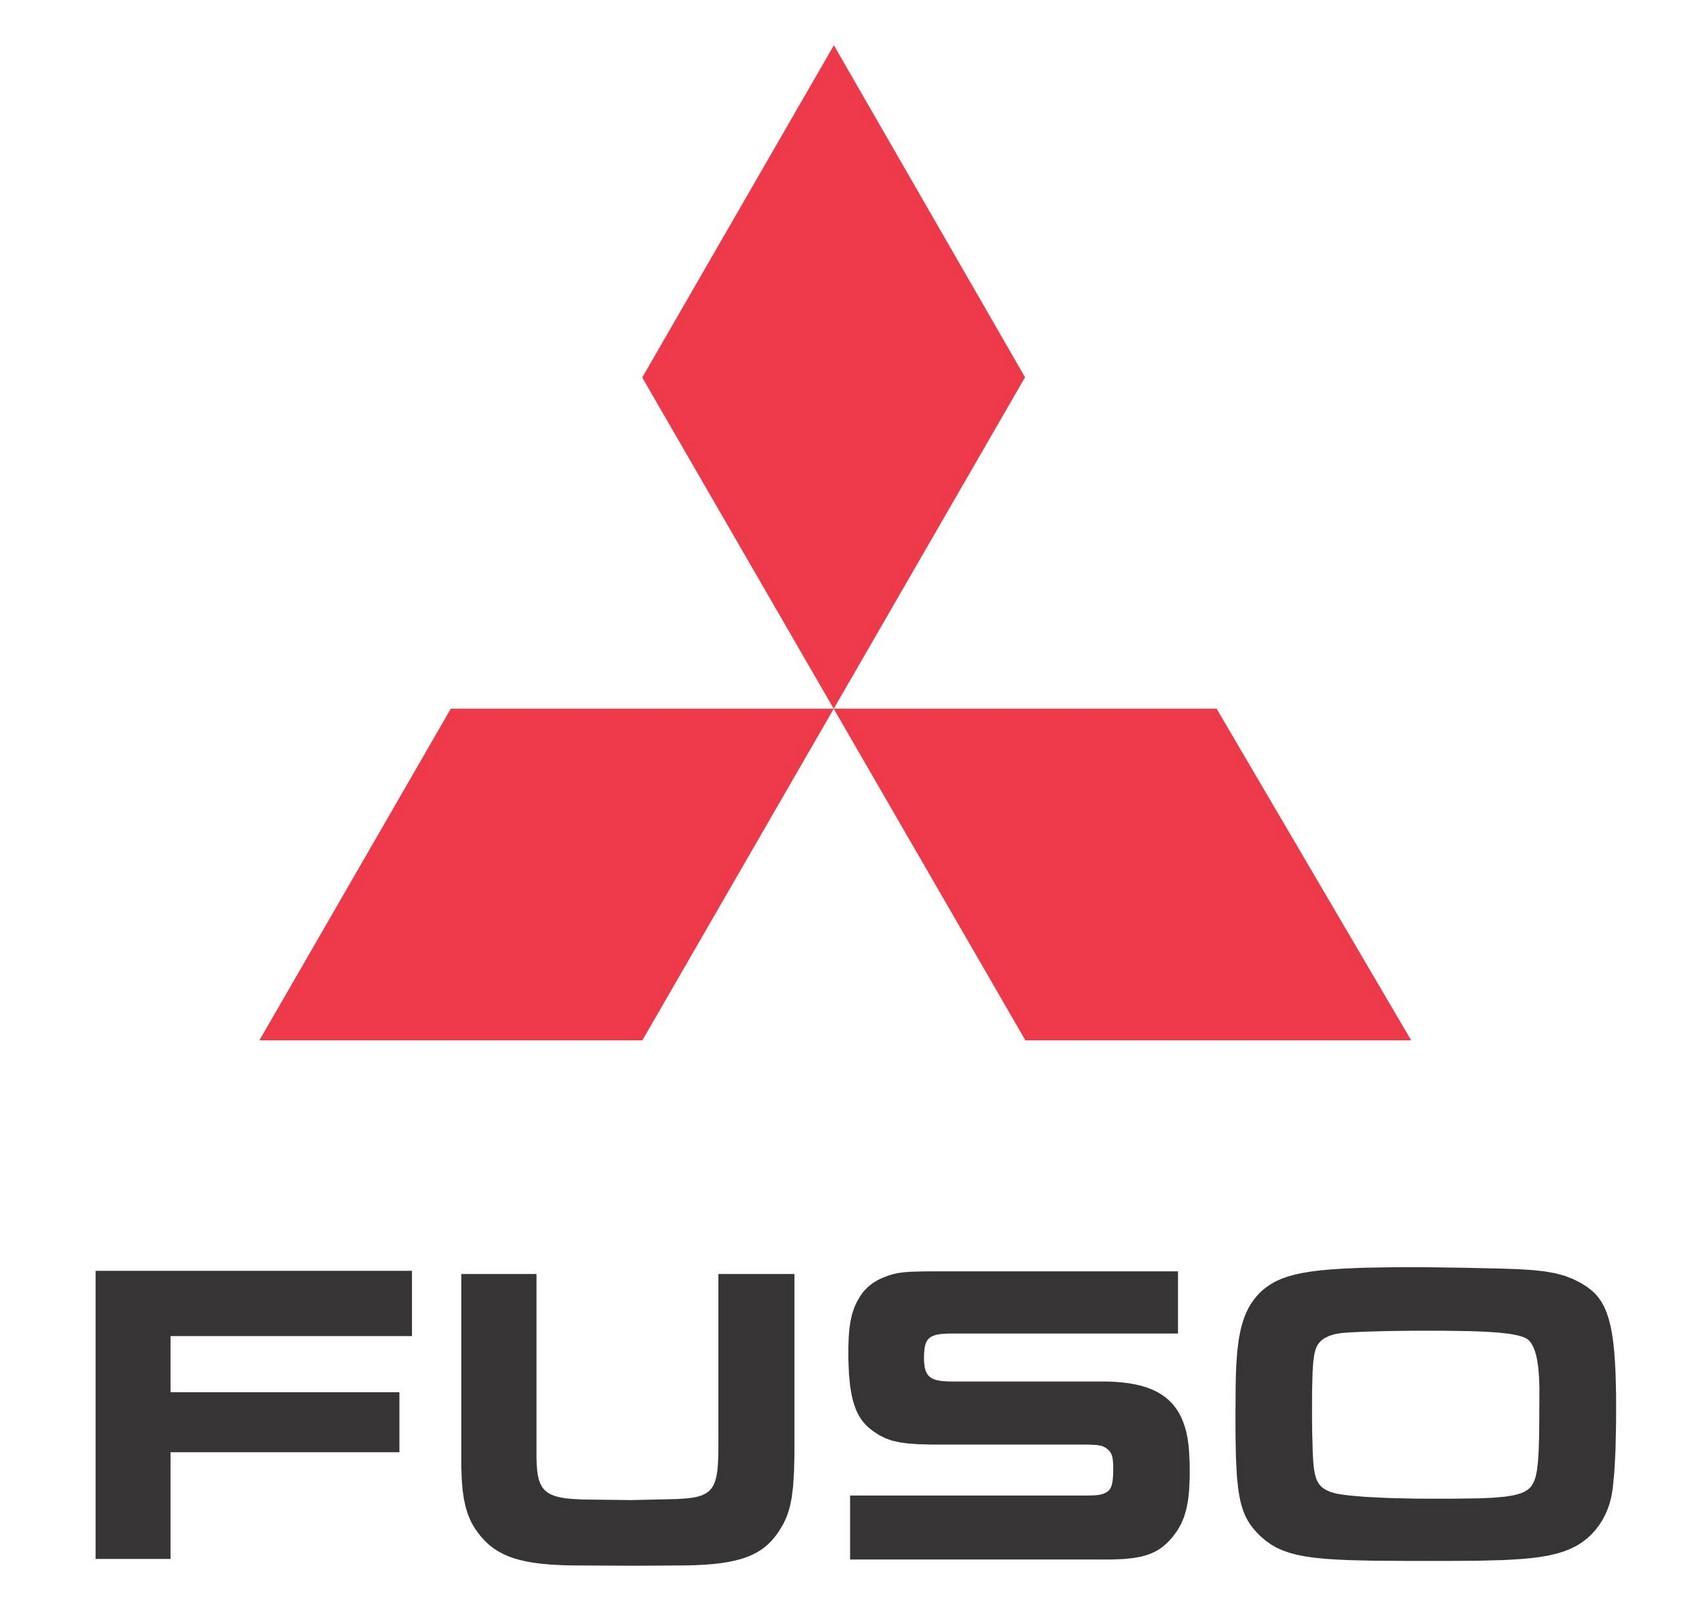 Mitsubishi logo clipart.